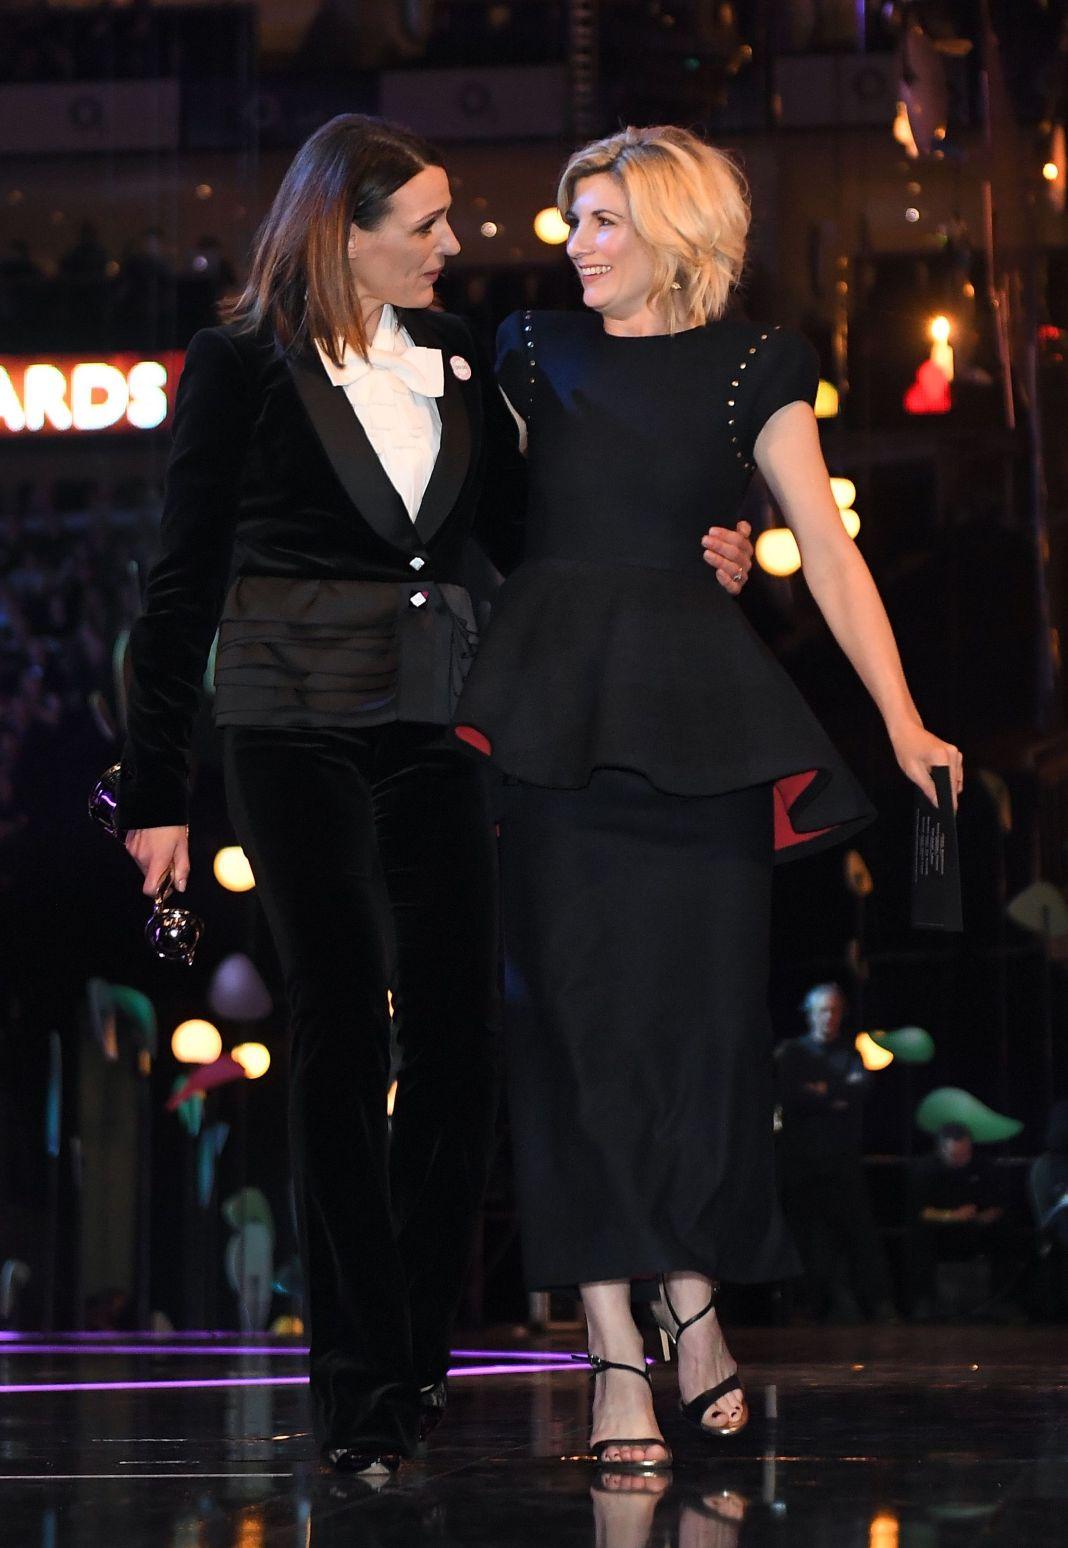 National Television Awards, Backstage, O2, London, UK - 23 Jan 2018 - James Gourley/REX/Shutterstock